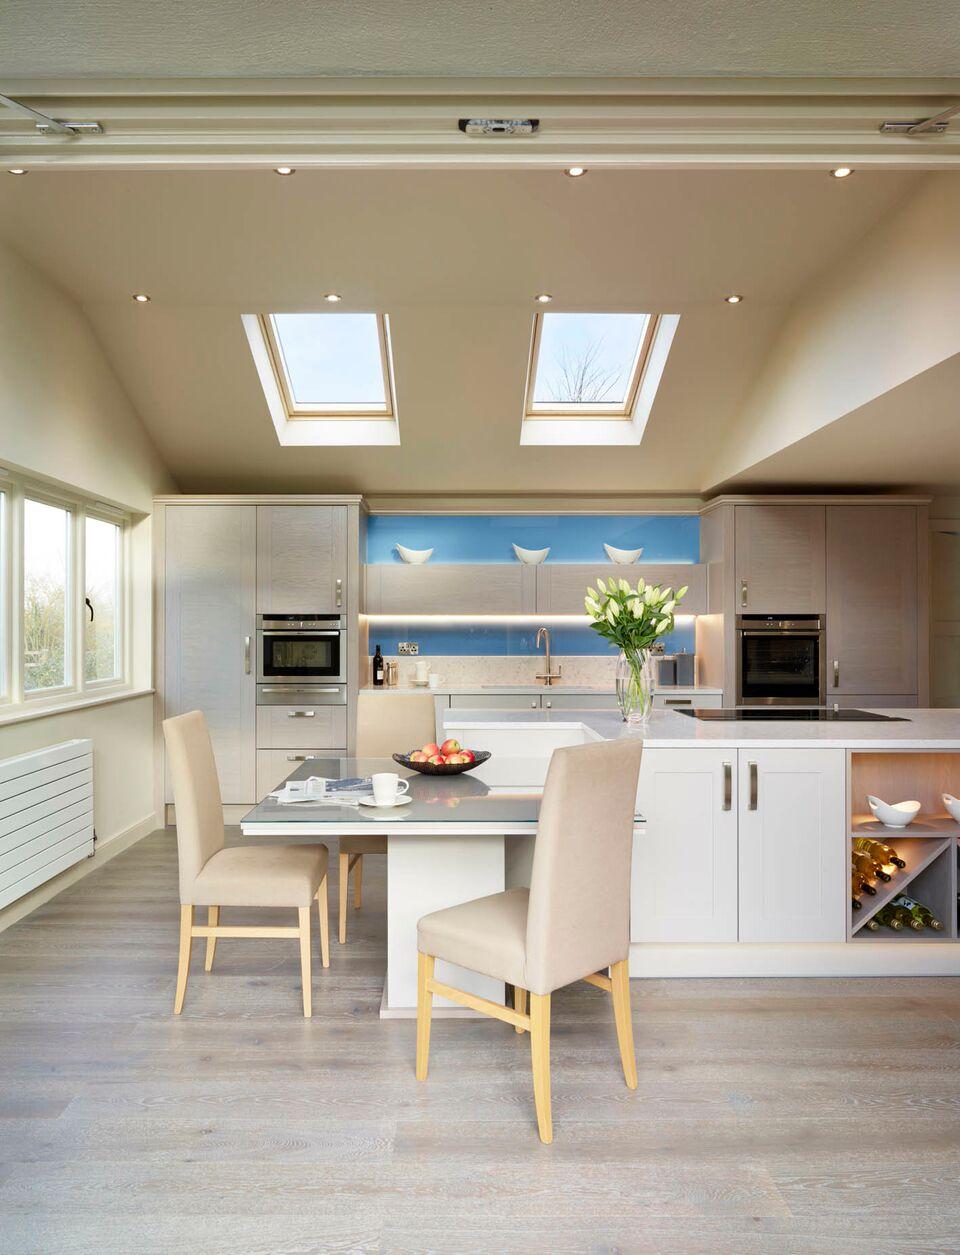 Uncategorized Kitchen Design Cambridge cambridge kitchens is proud to be working with potton kitchen design event